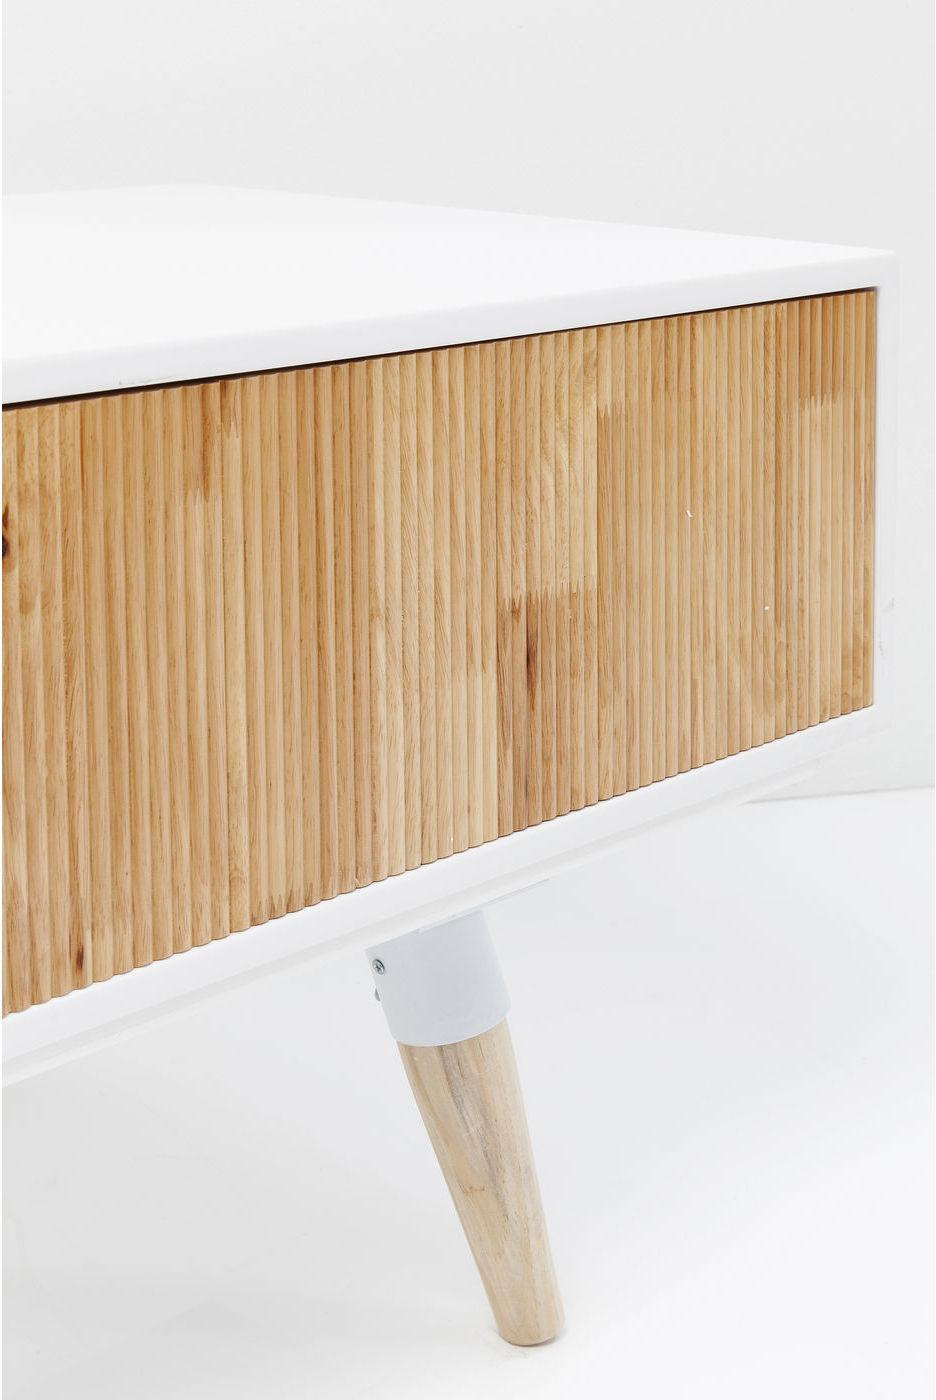 Kare Design Salute TV-meubel - 160x45x43 Cm